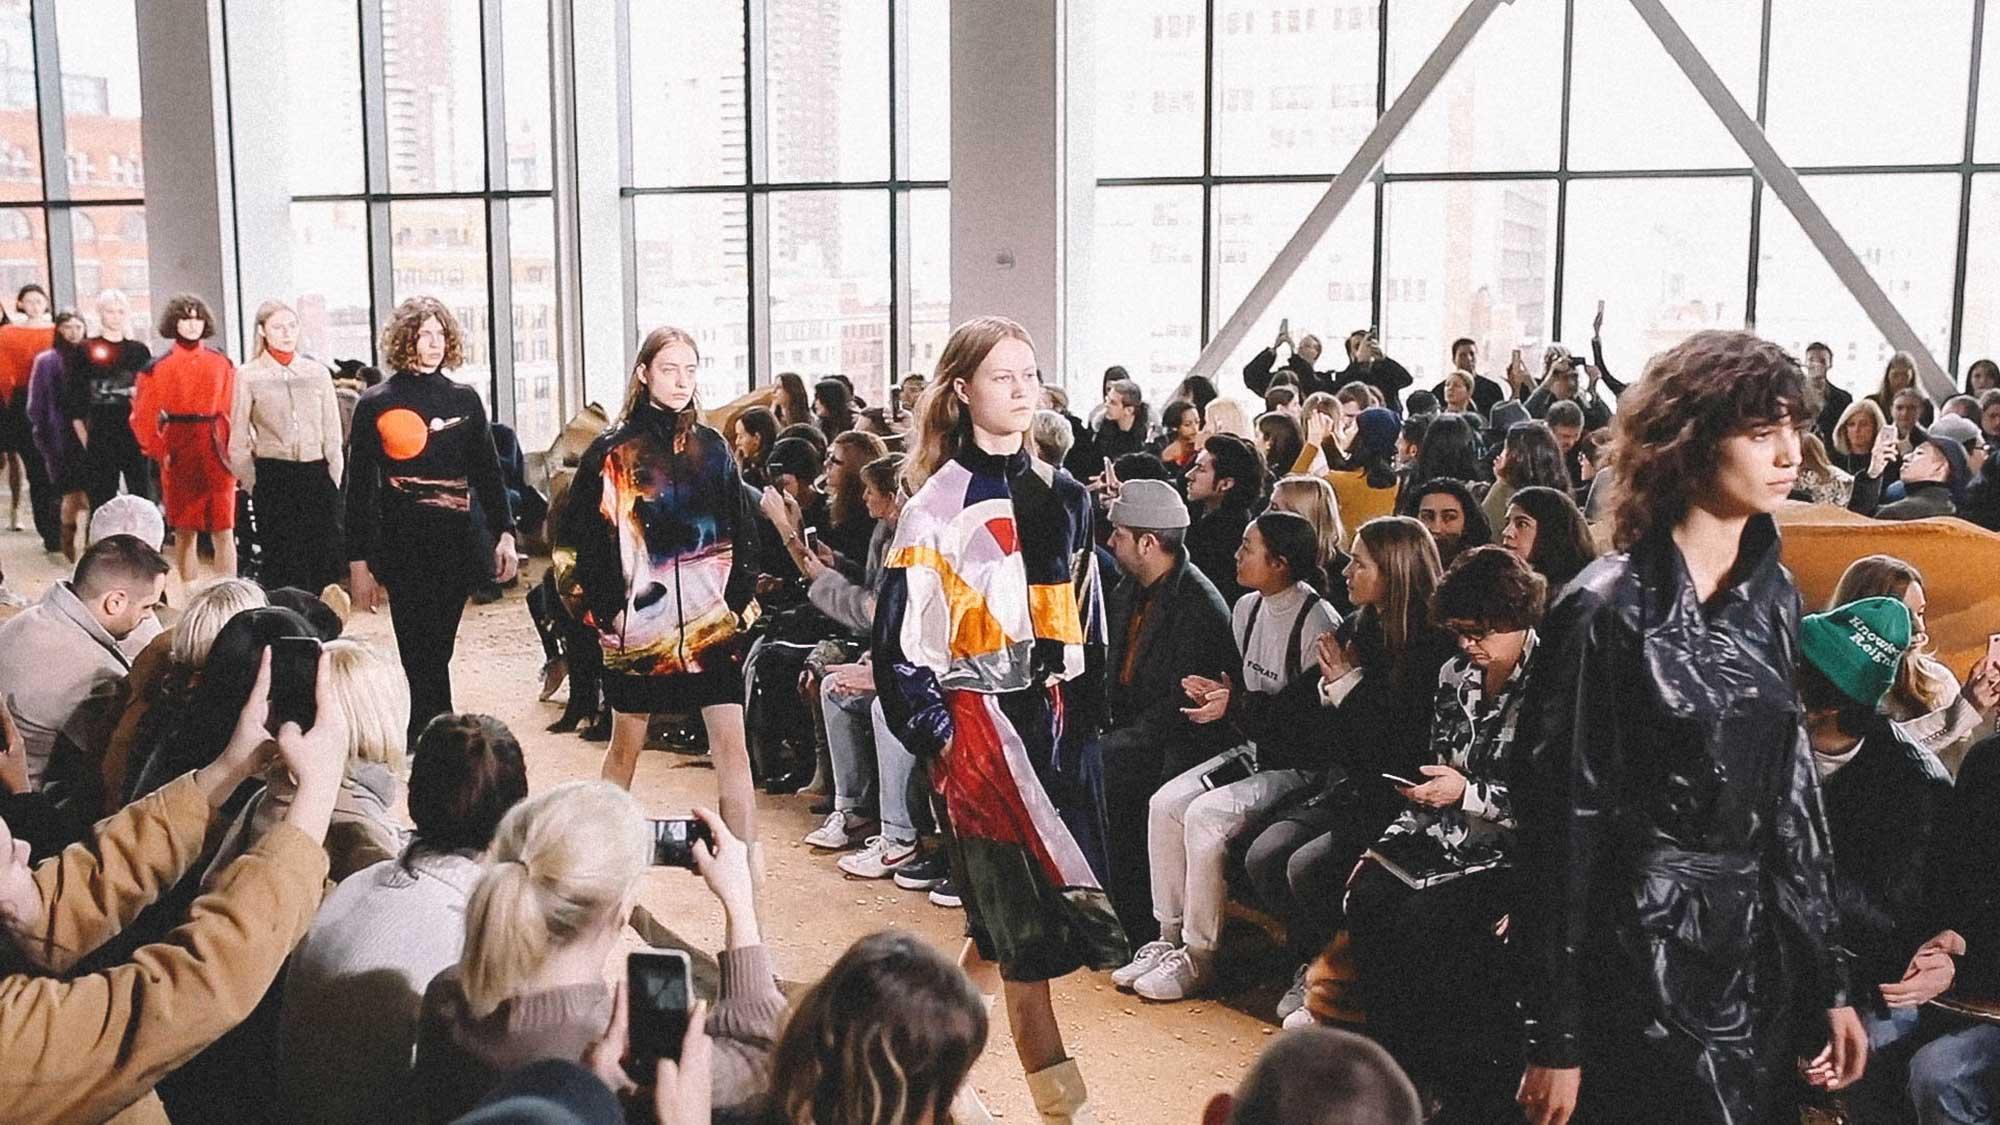 Lacoste-Runway-Show-New-York-Fashion-Week-6.jpg